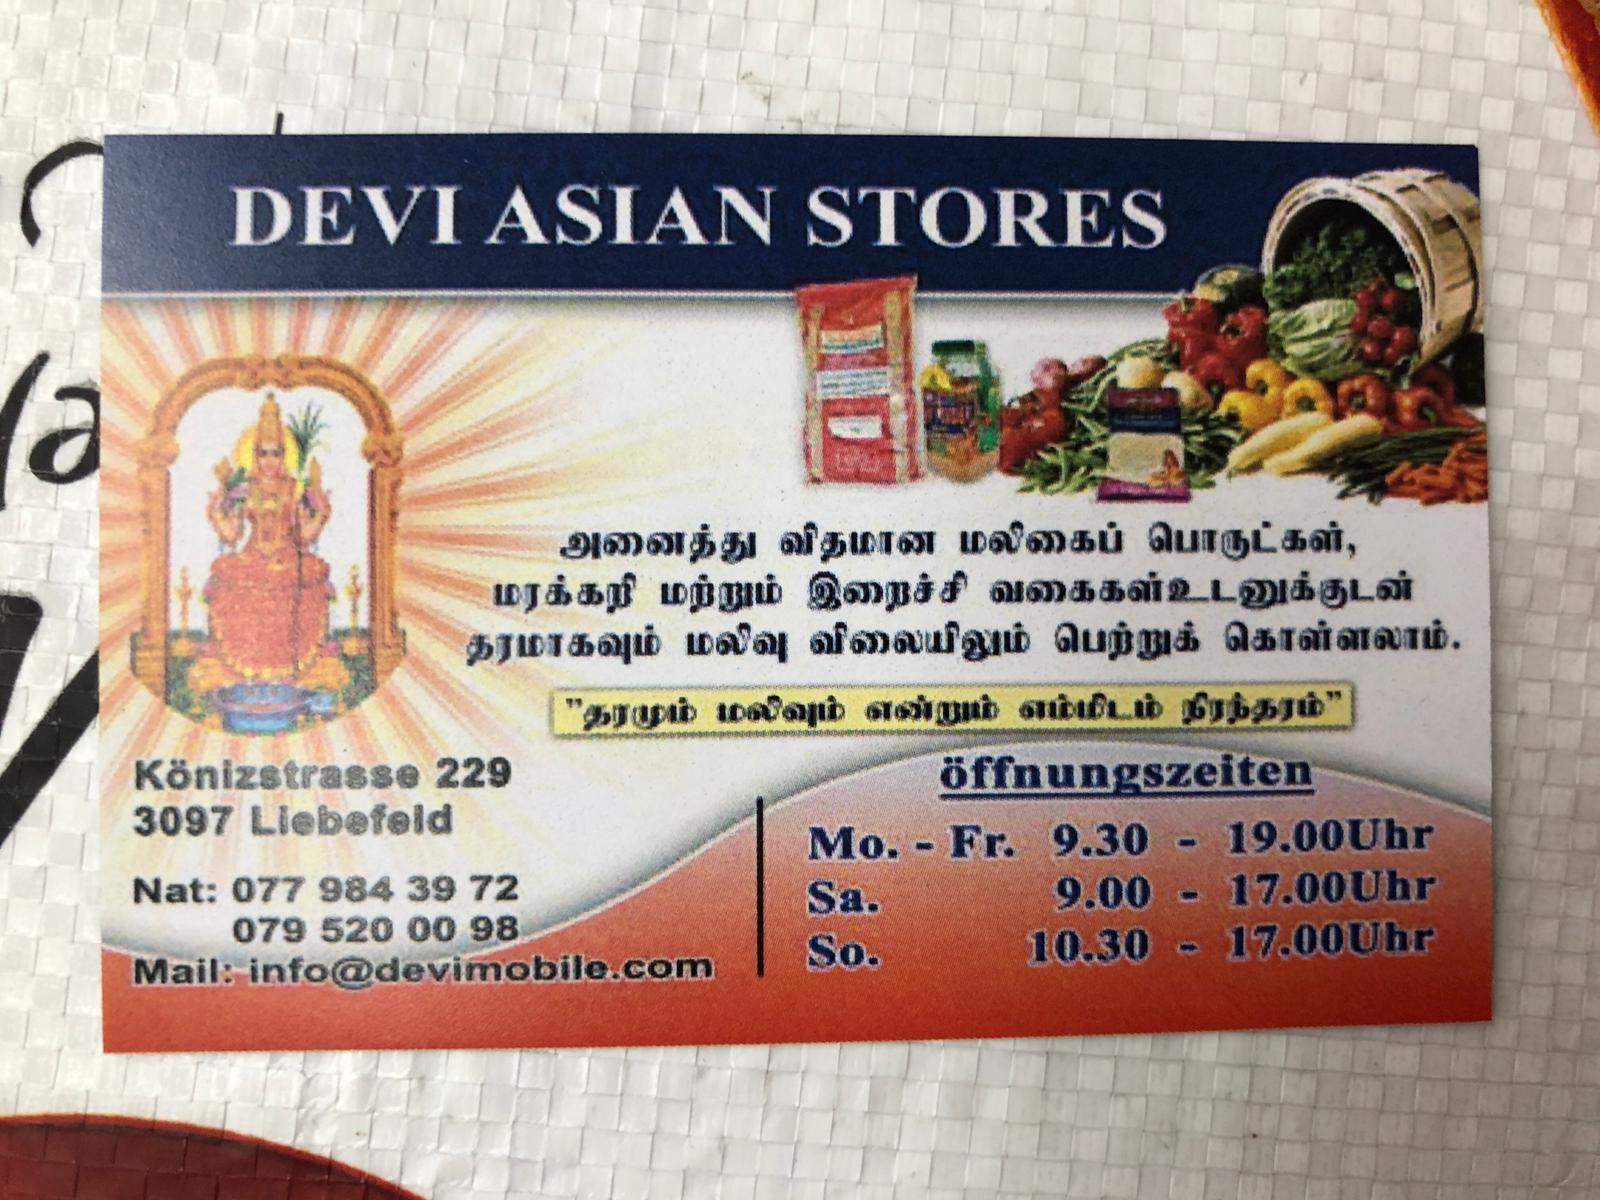 Devi Asian Stores